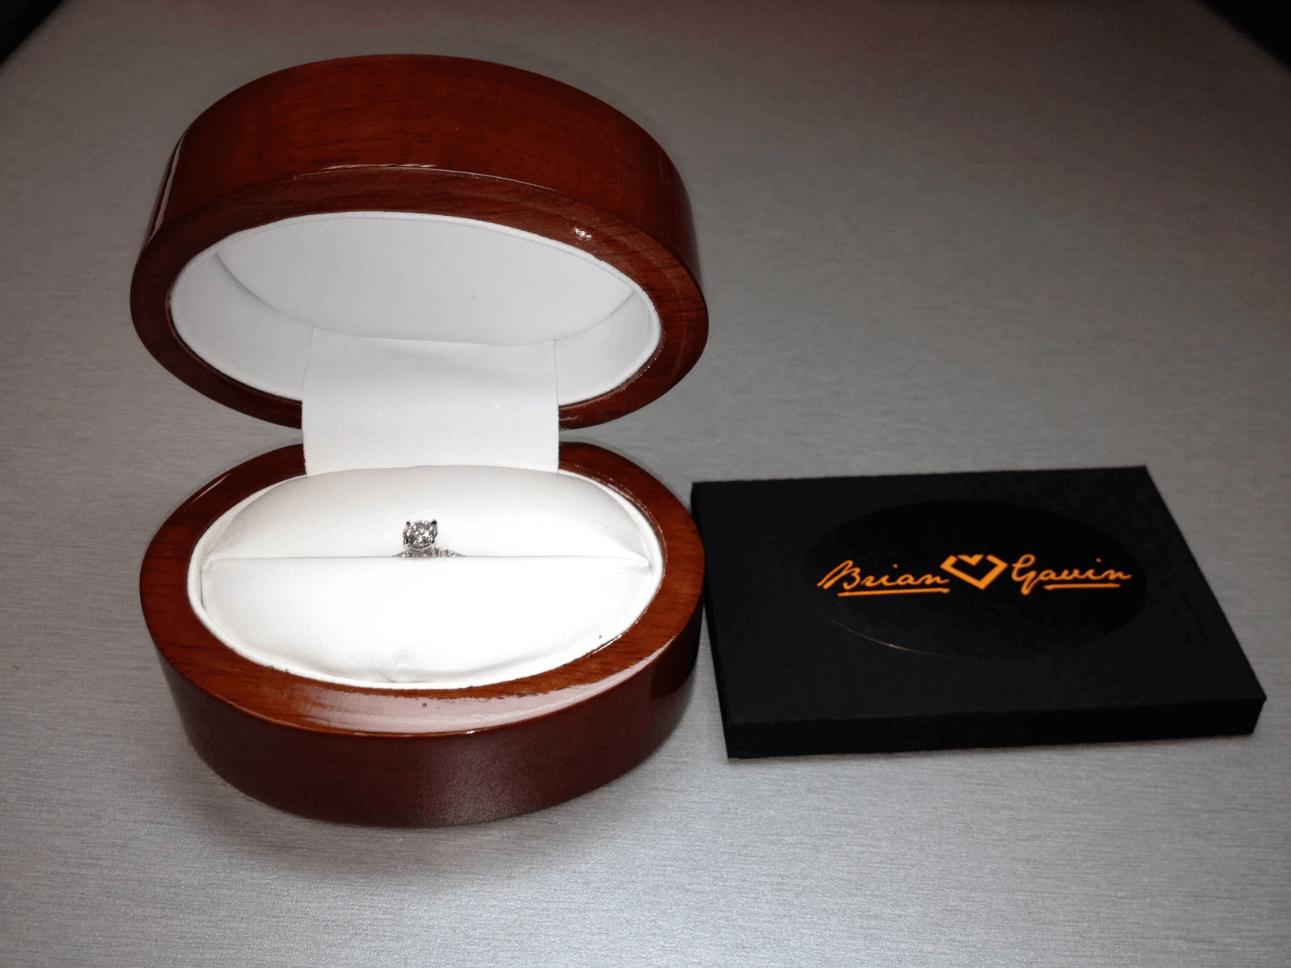 Ring in ring box from Brian Gavin Diamonds